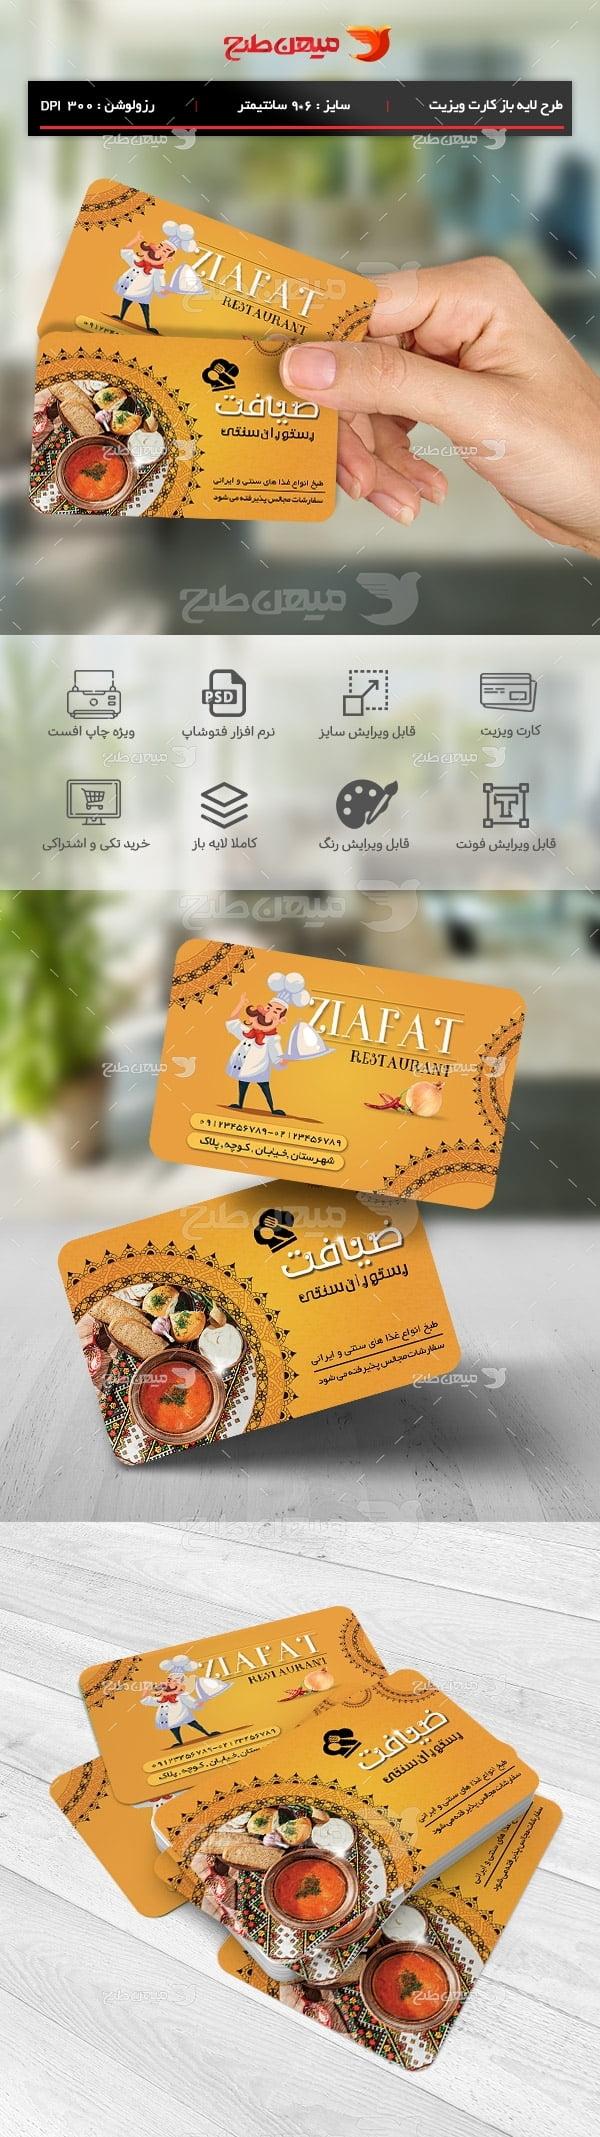 طرح لایه باز کارت ویزیت رستوران سنتی